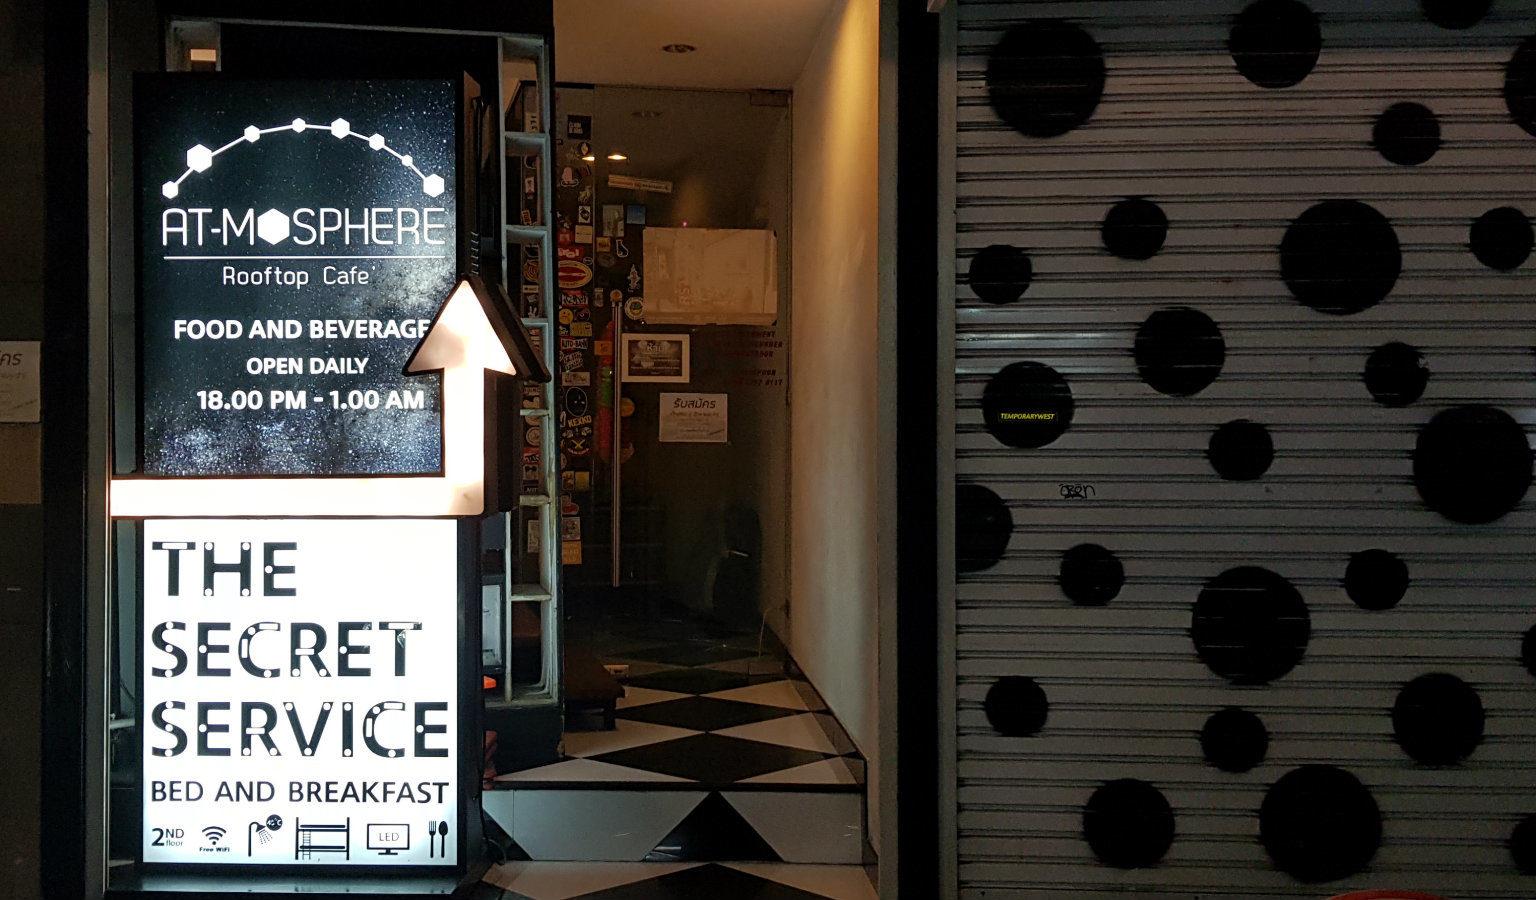 Entree At-Mosphere Rooftop Café in Bangkok, Thailand